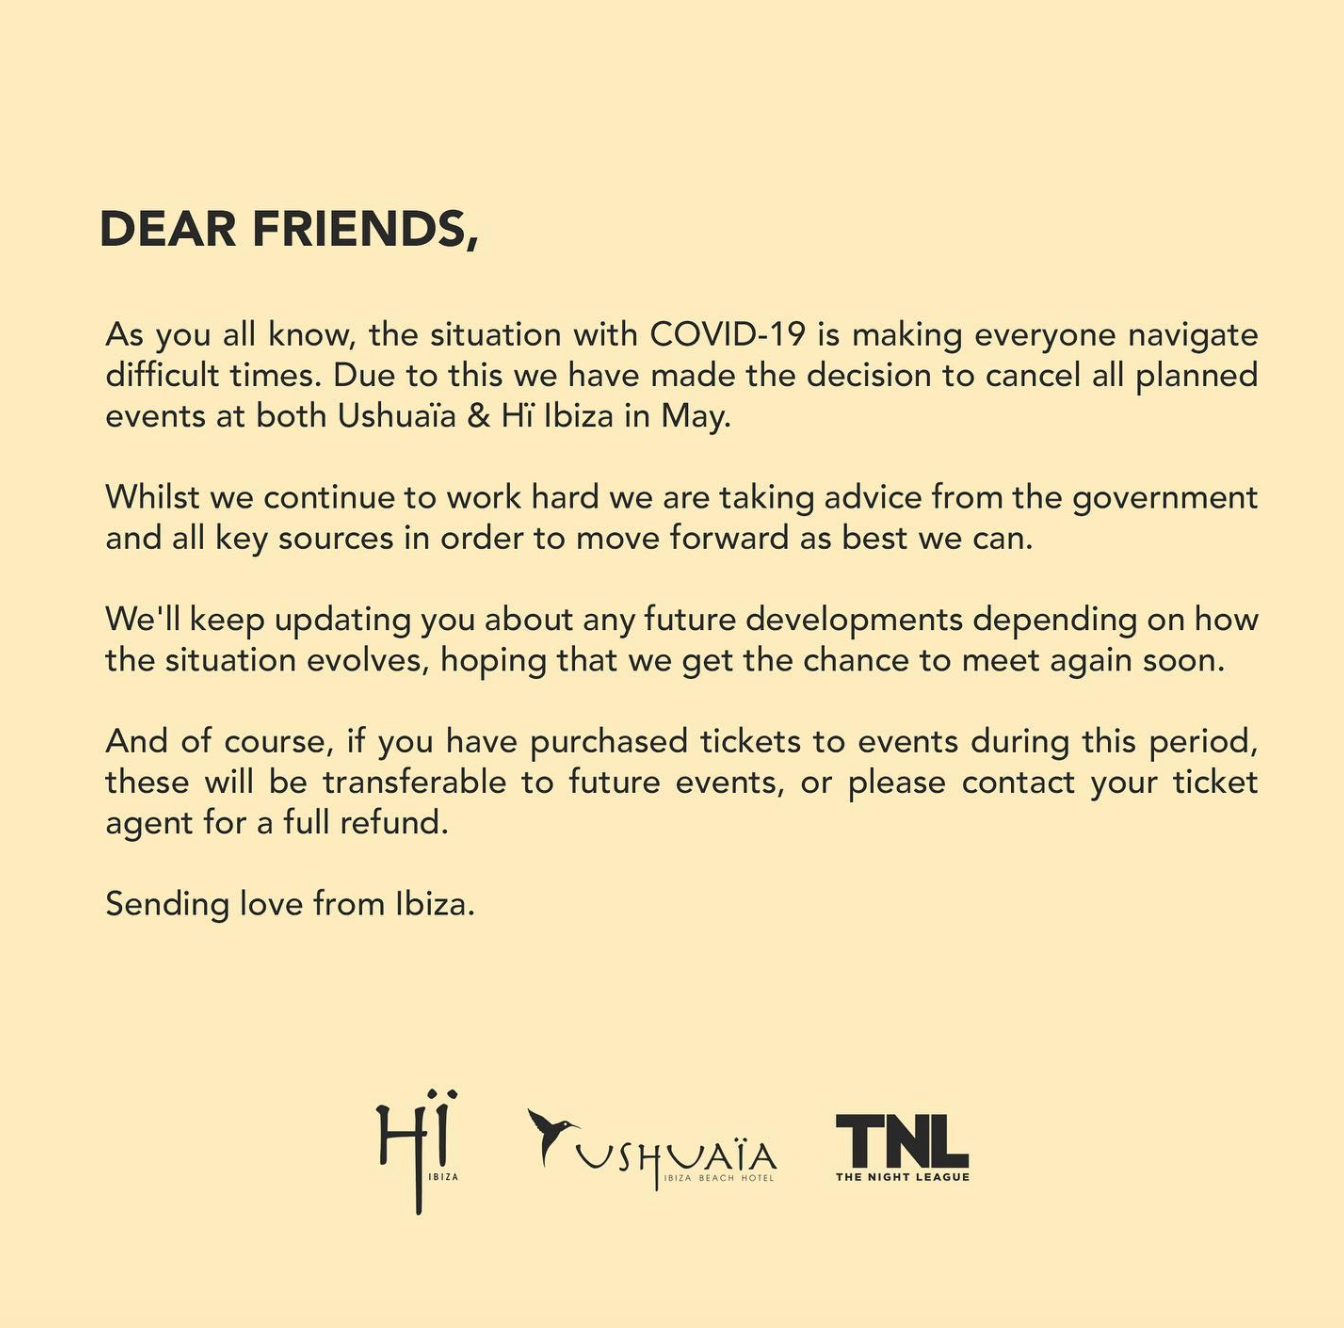 Ushuaïa Ibiza and Hï Ibiza won't open this May, due to Covid-19